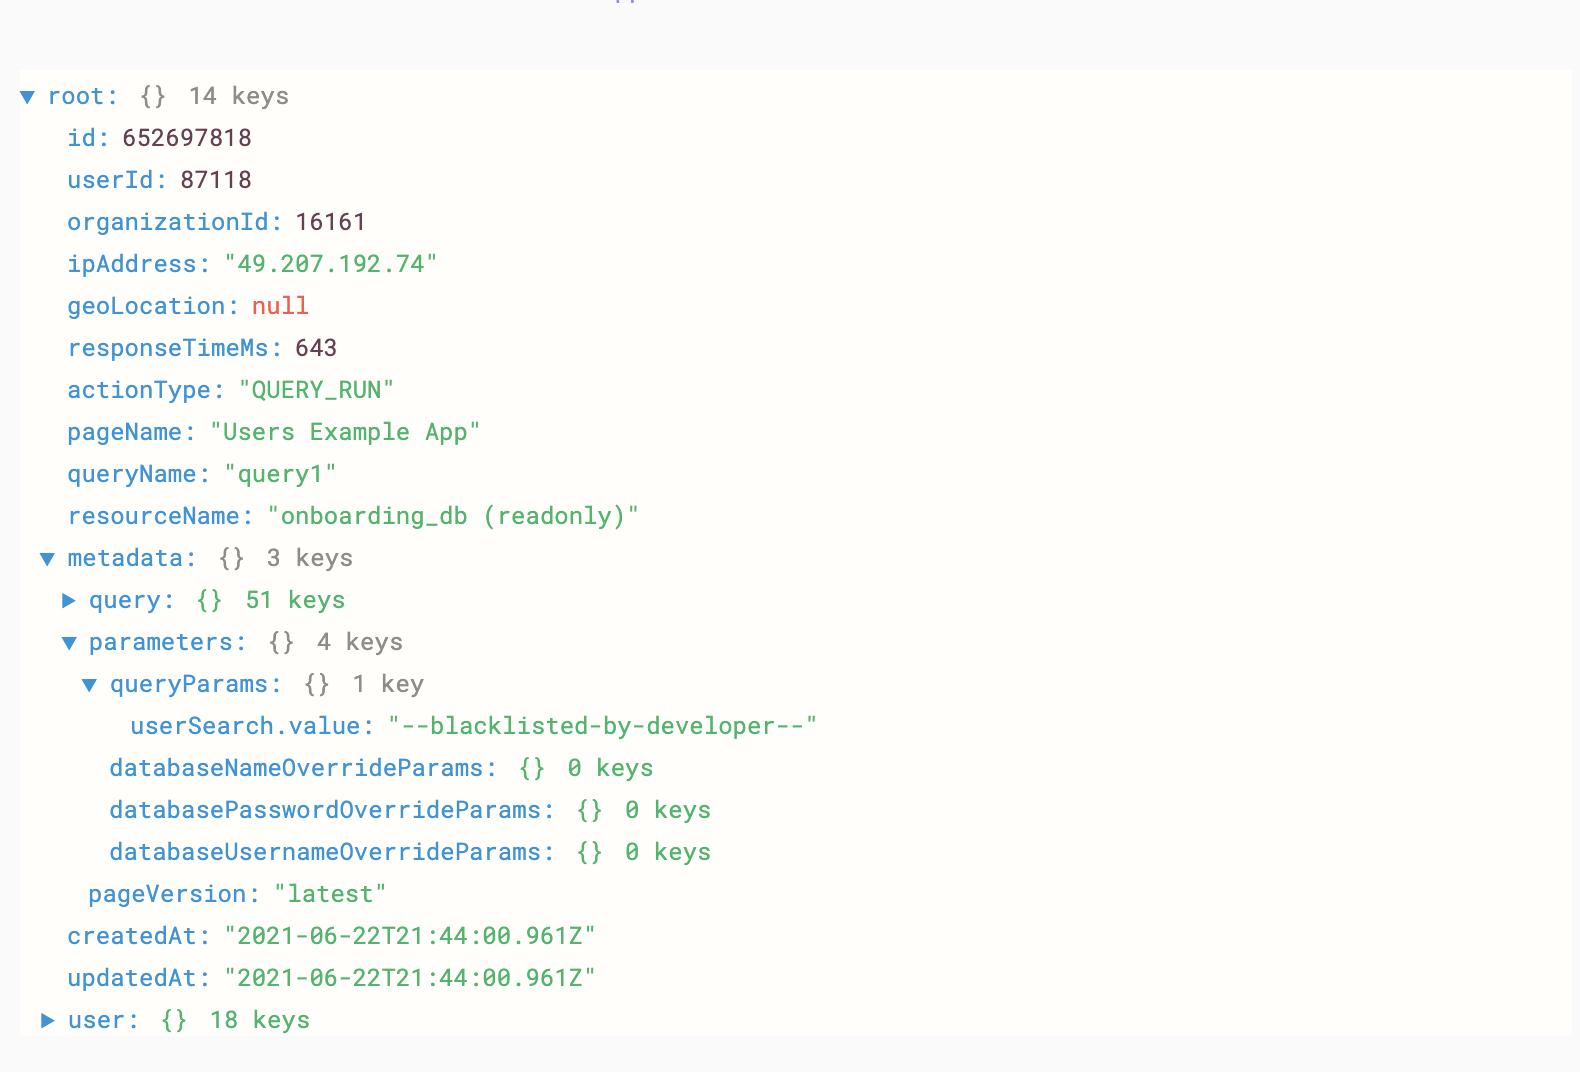 Blacklisting the value of `textinput1.value`.